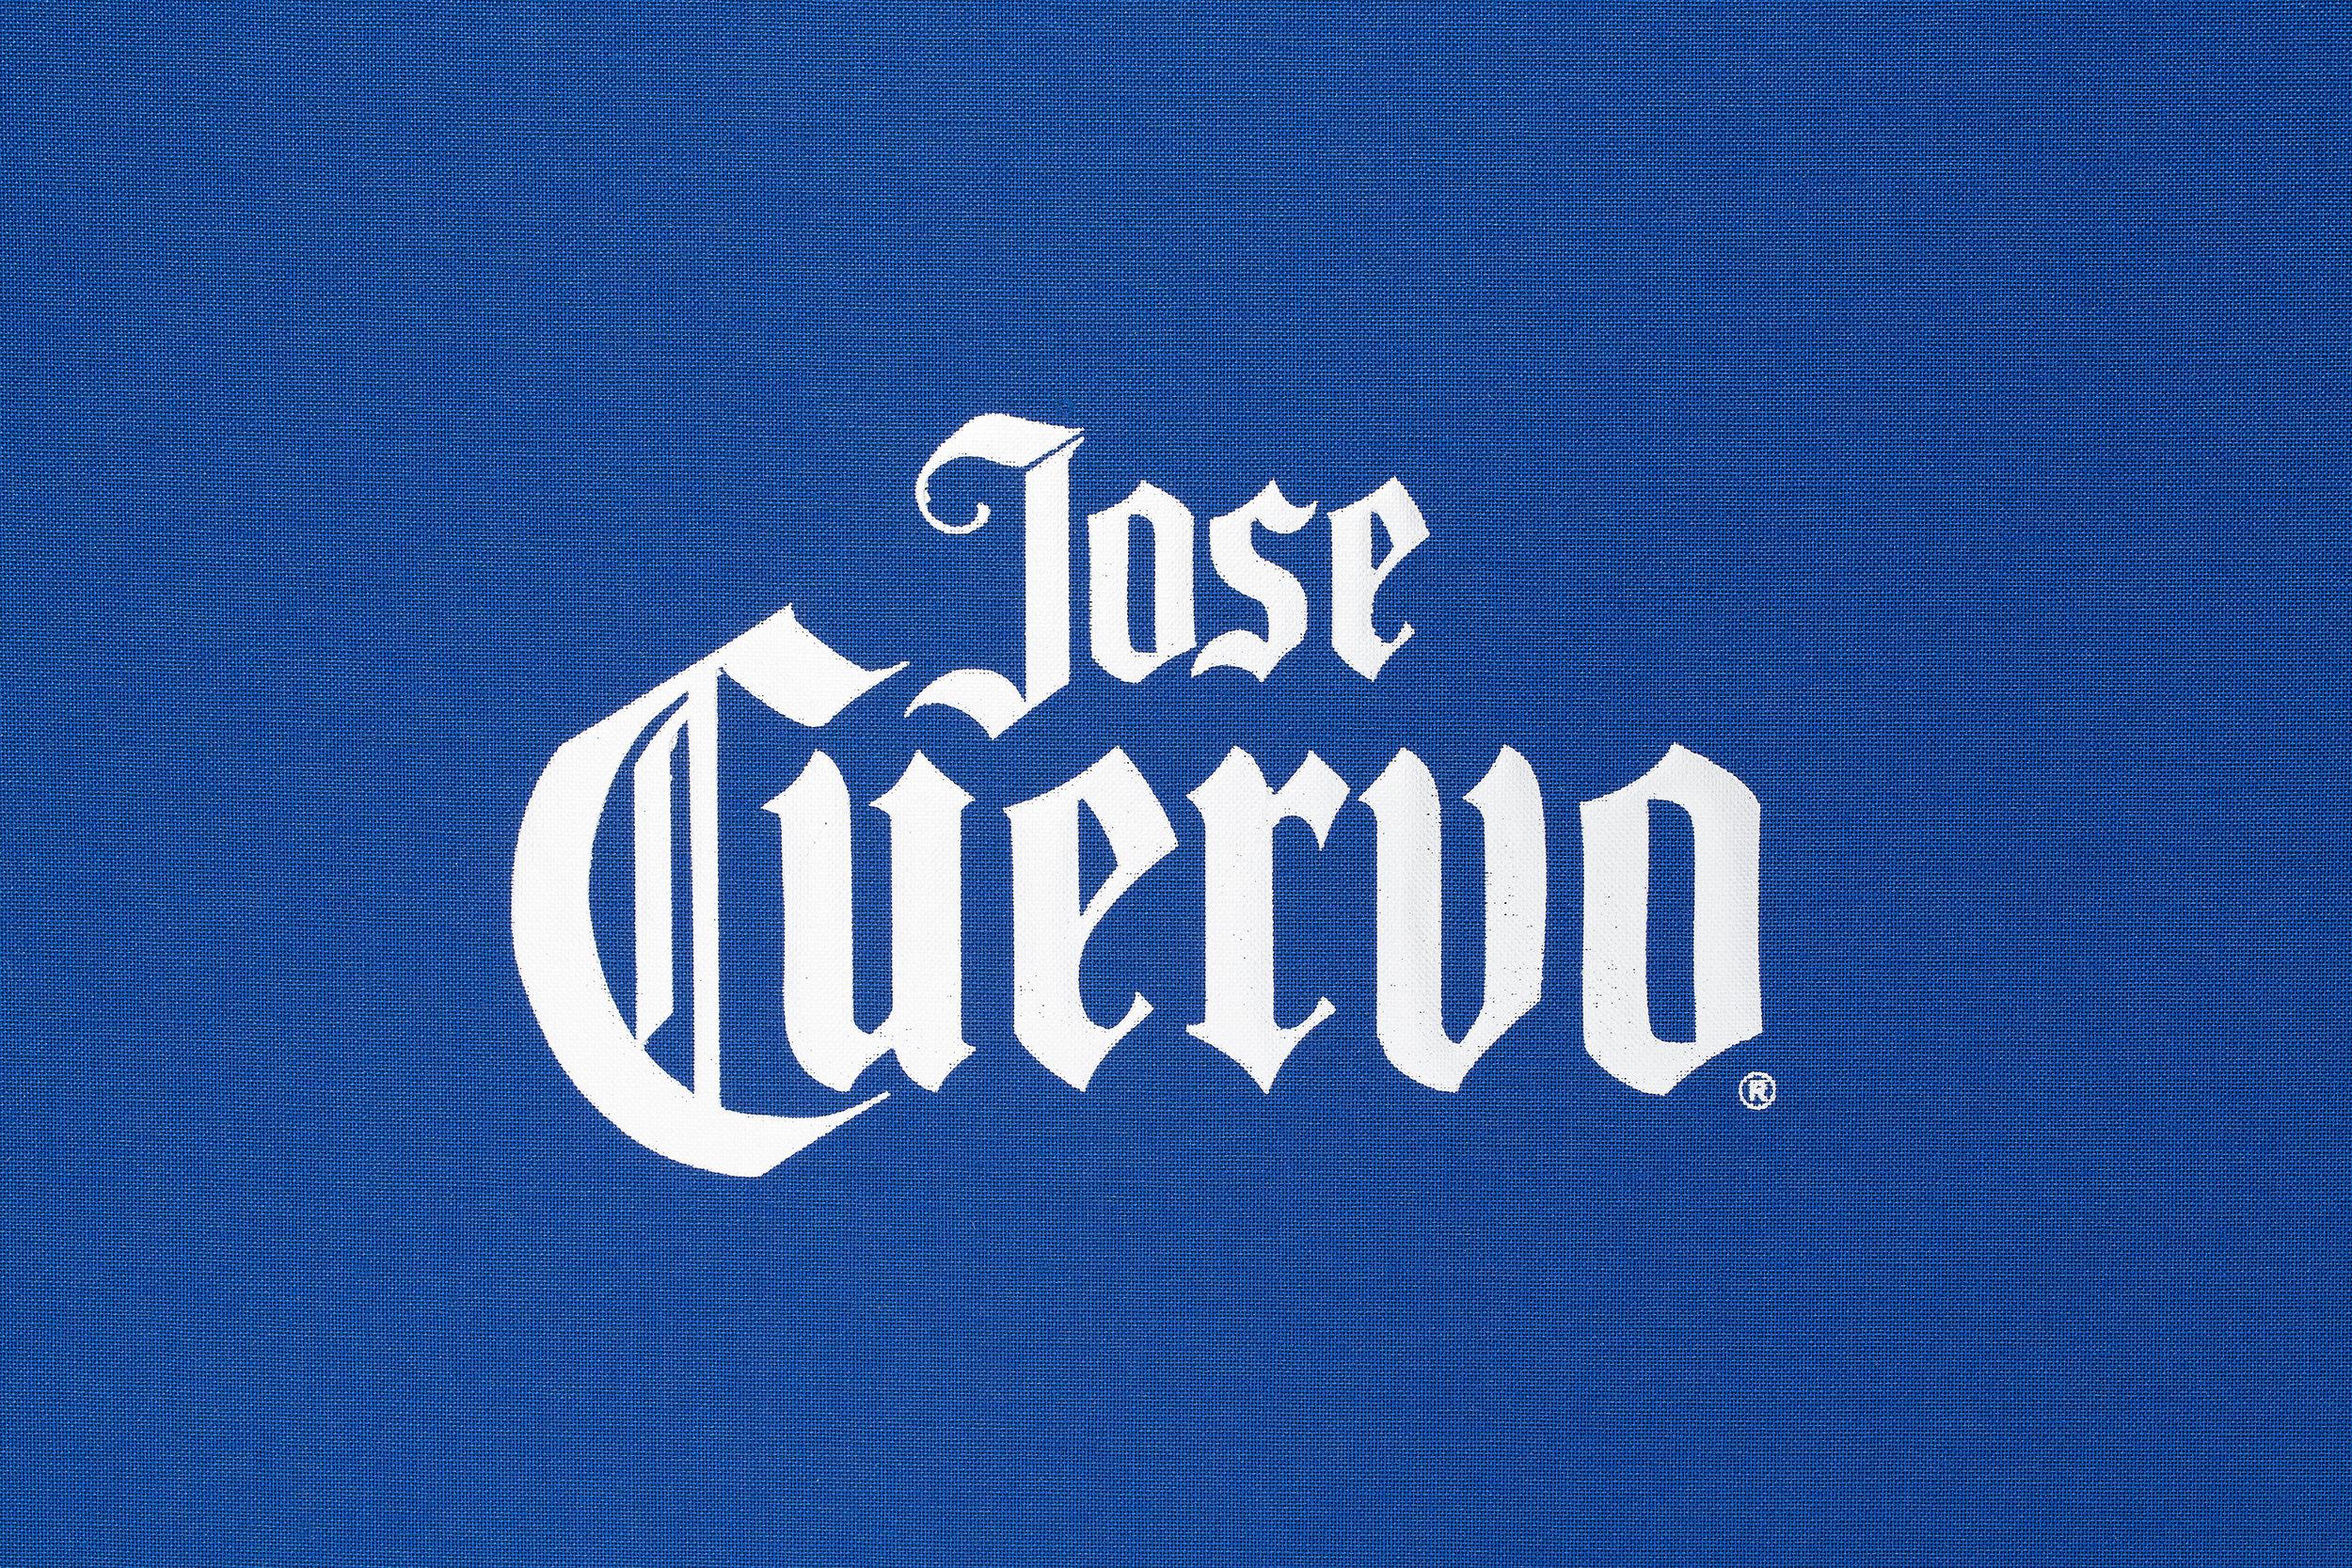 Jose_cuervo_box_2.jpg